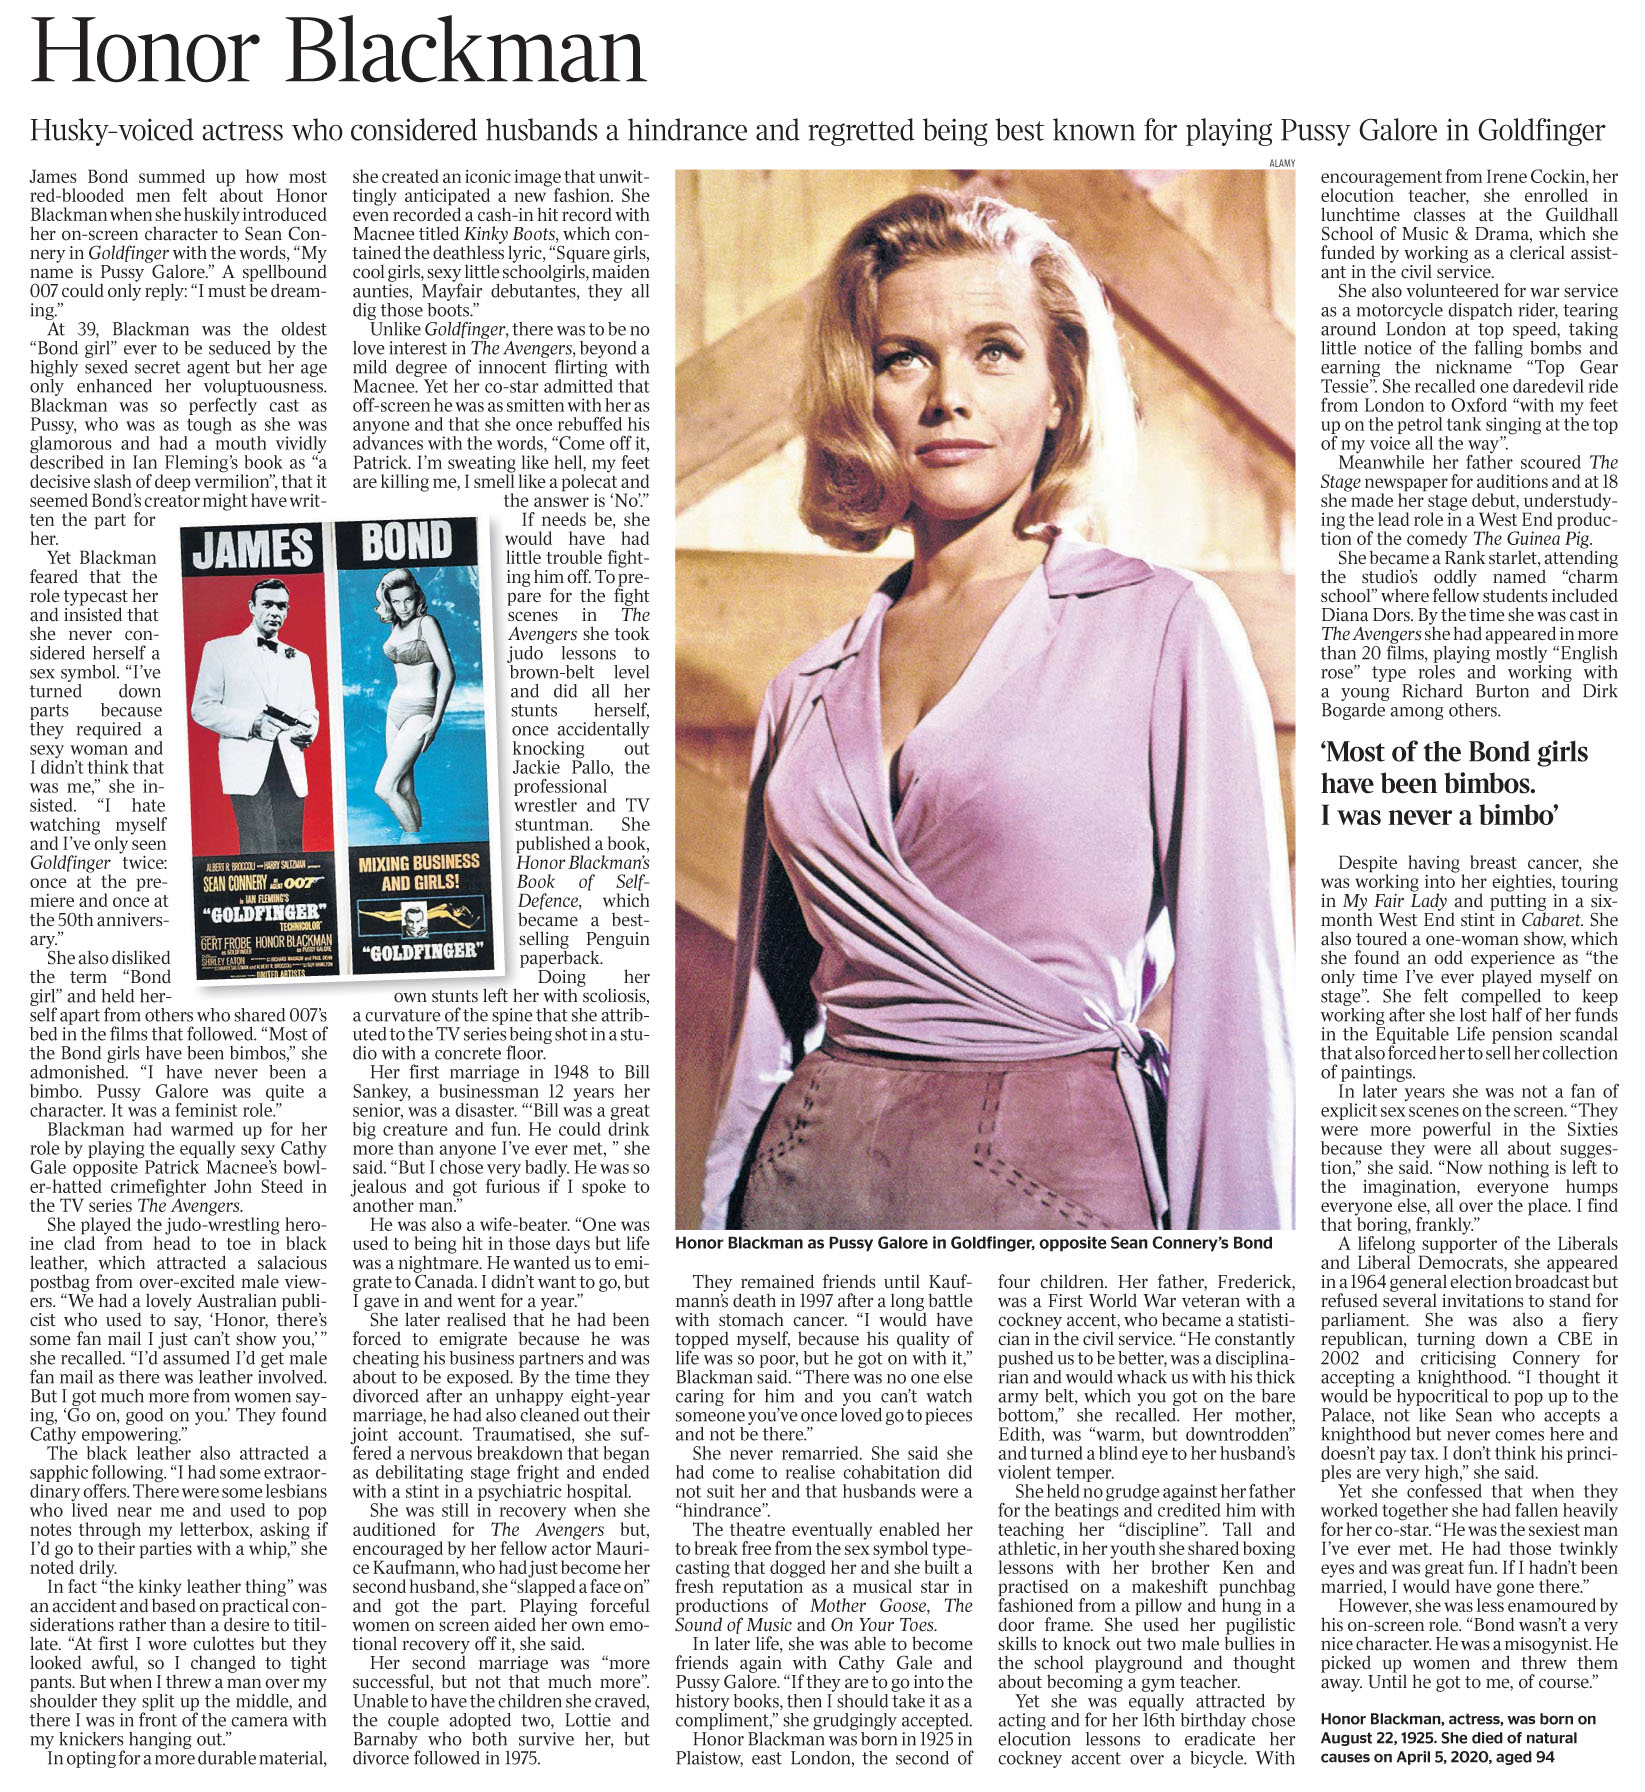 Times 200407 Bond.jpg